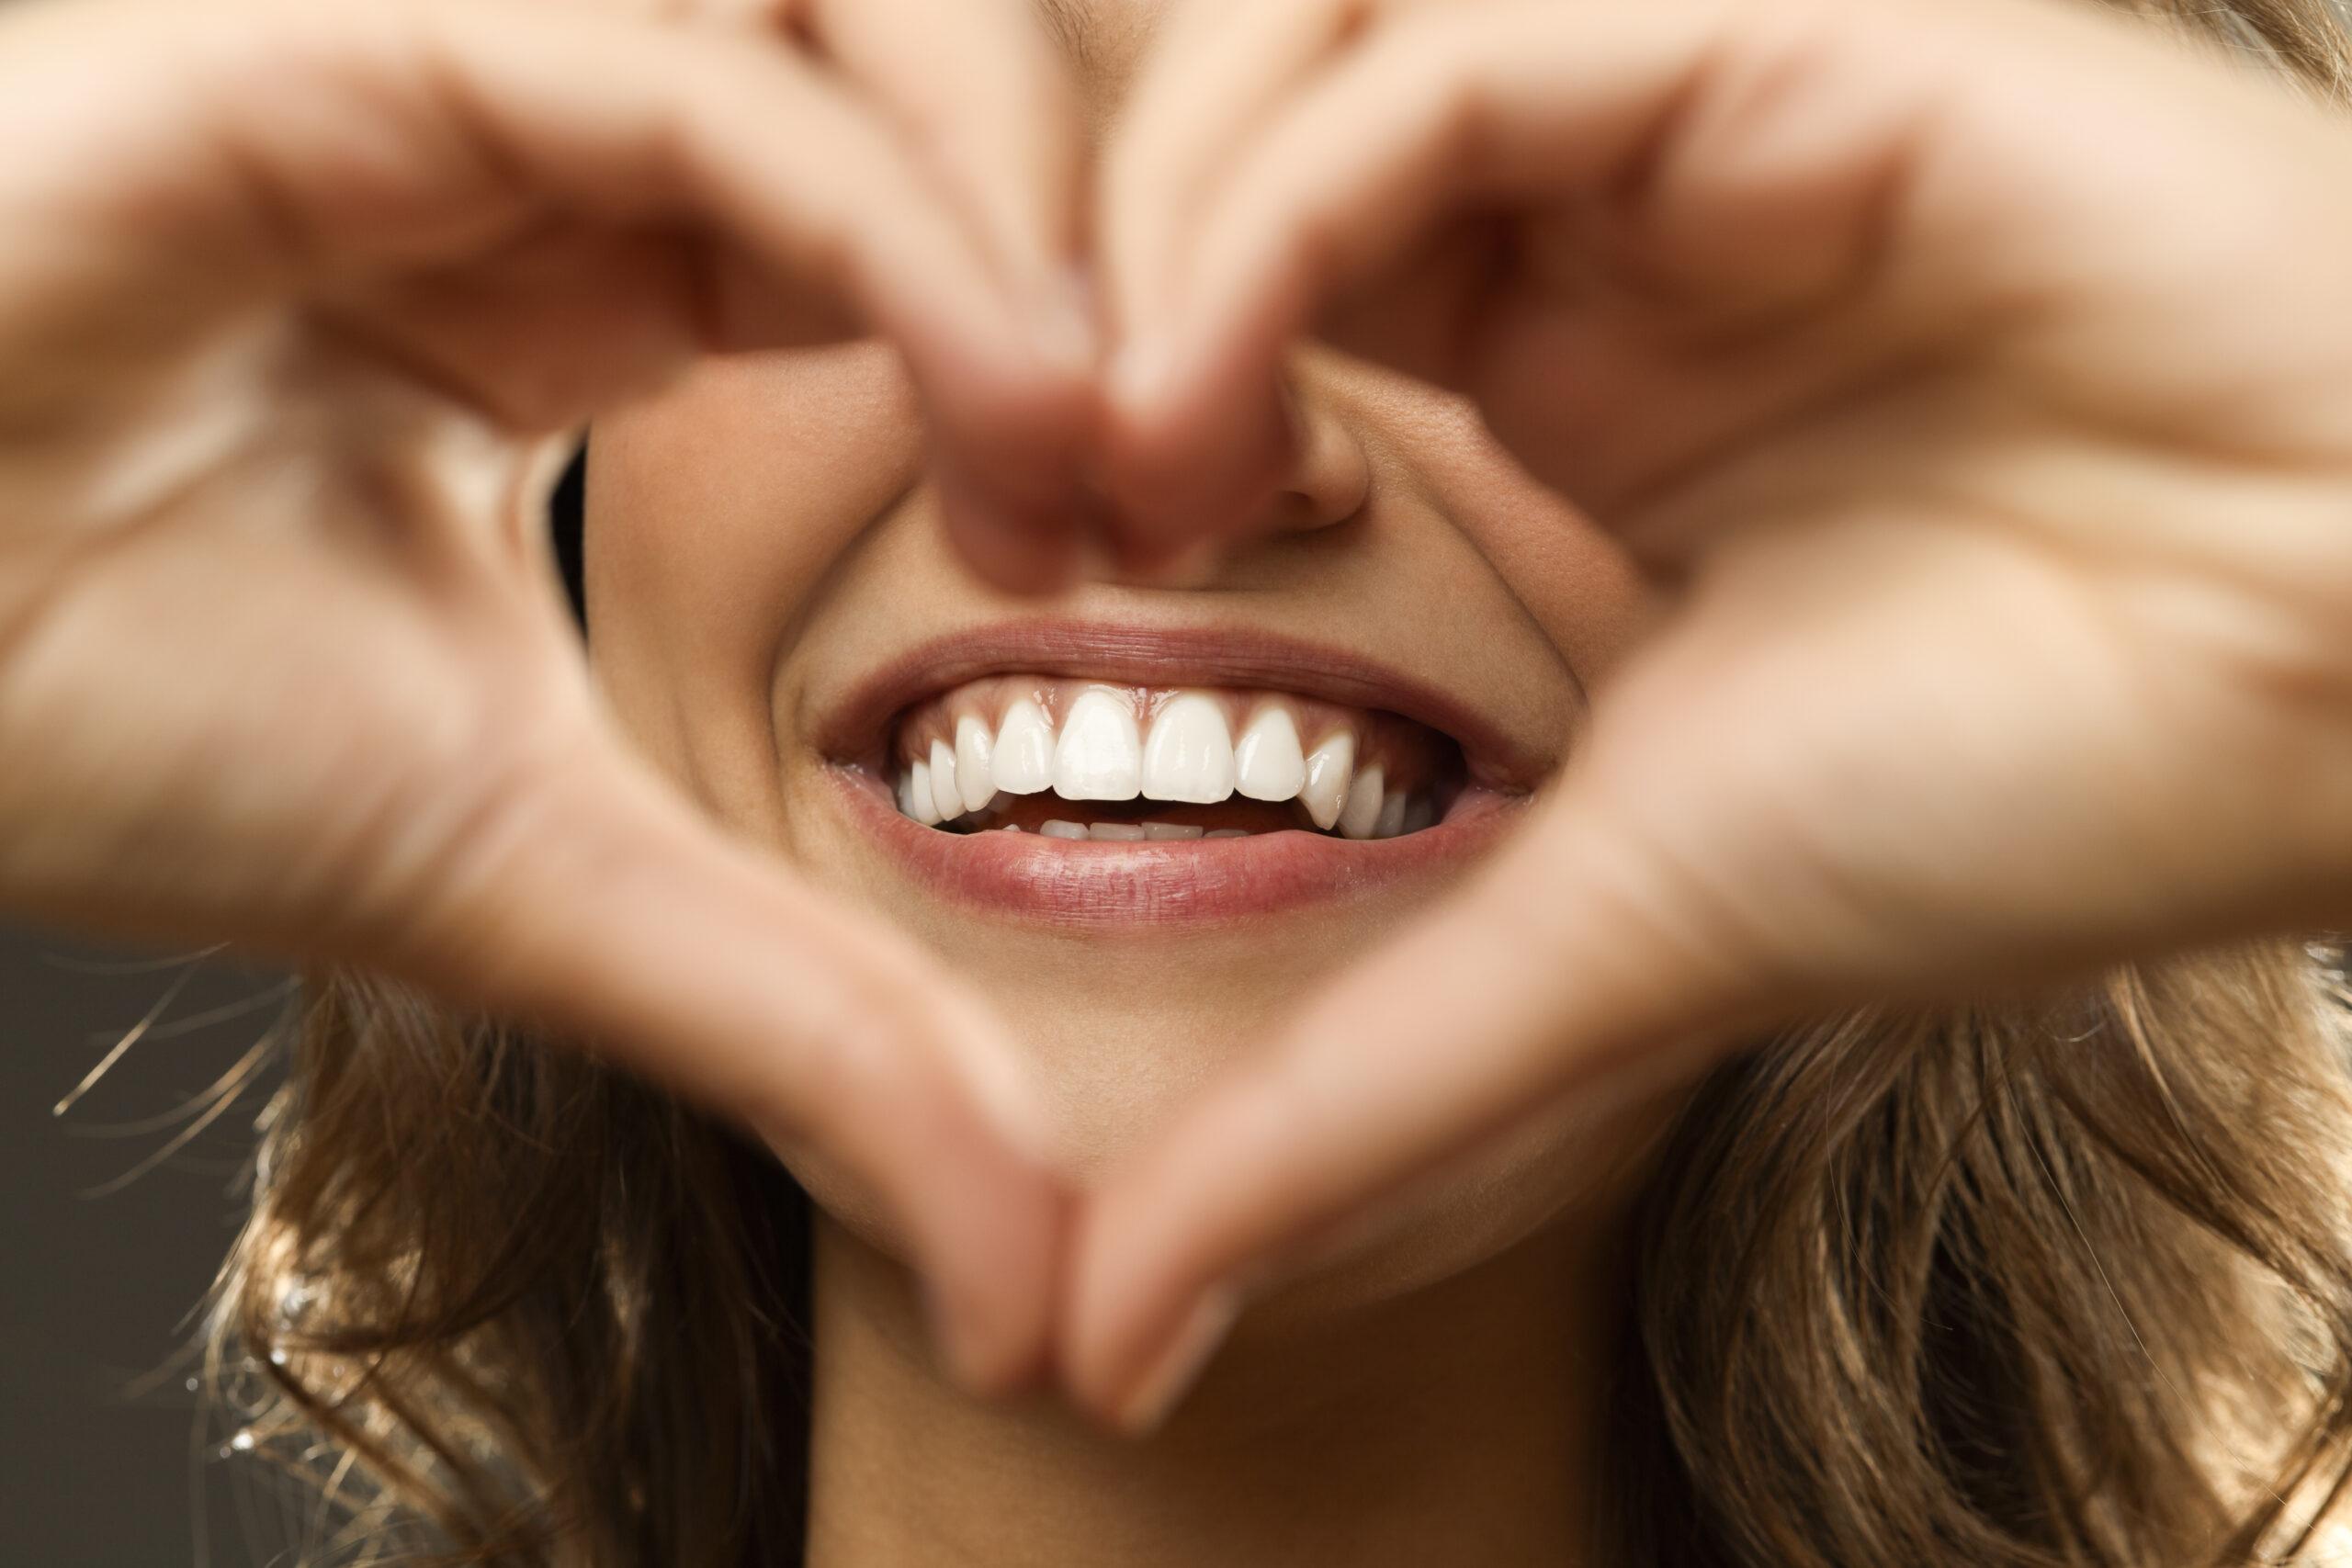 Aesthetische Zahnmedizin Haende als Herz